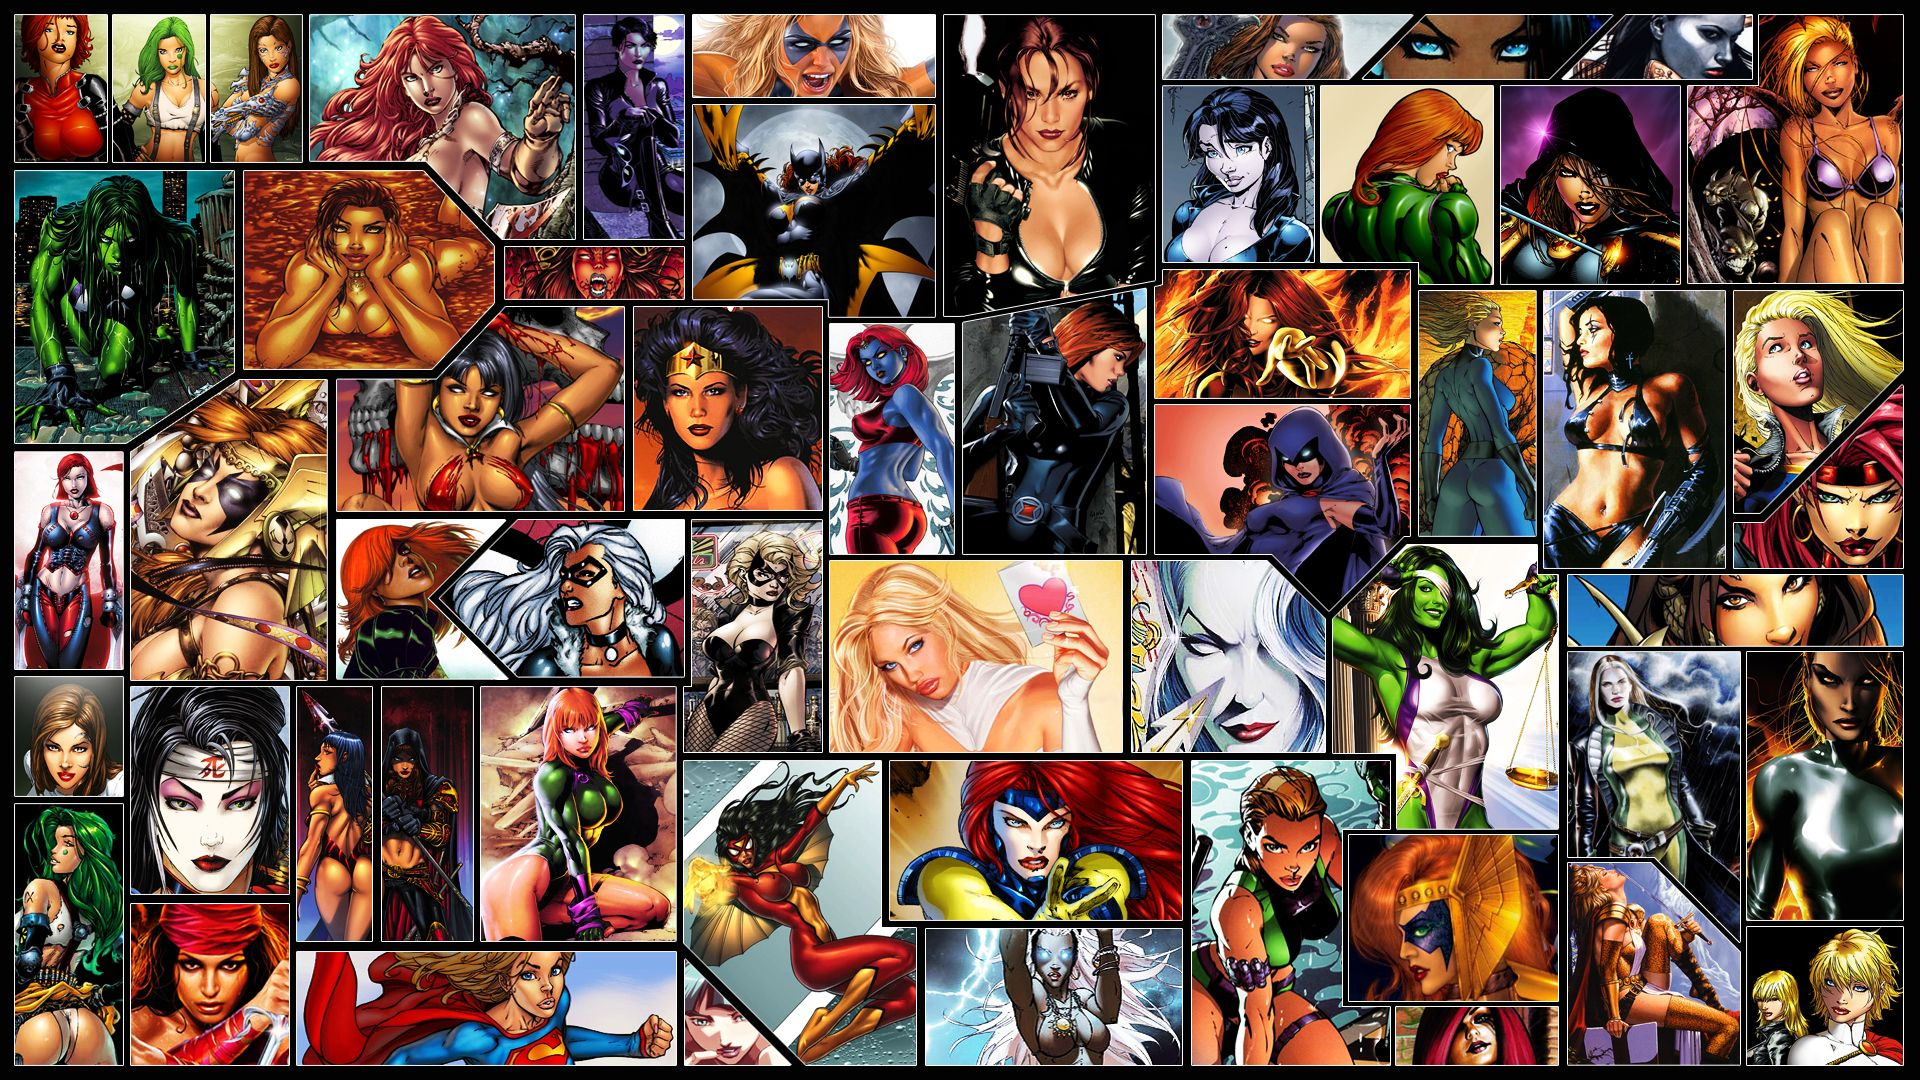 marvel comics | Marvel Cómics - Imágenes Parte 2 - - Taringa!